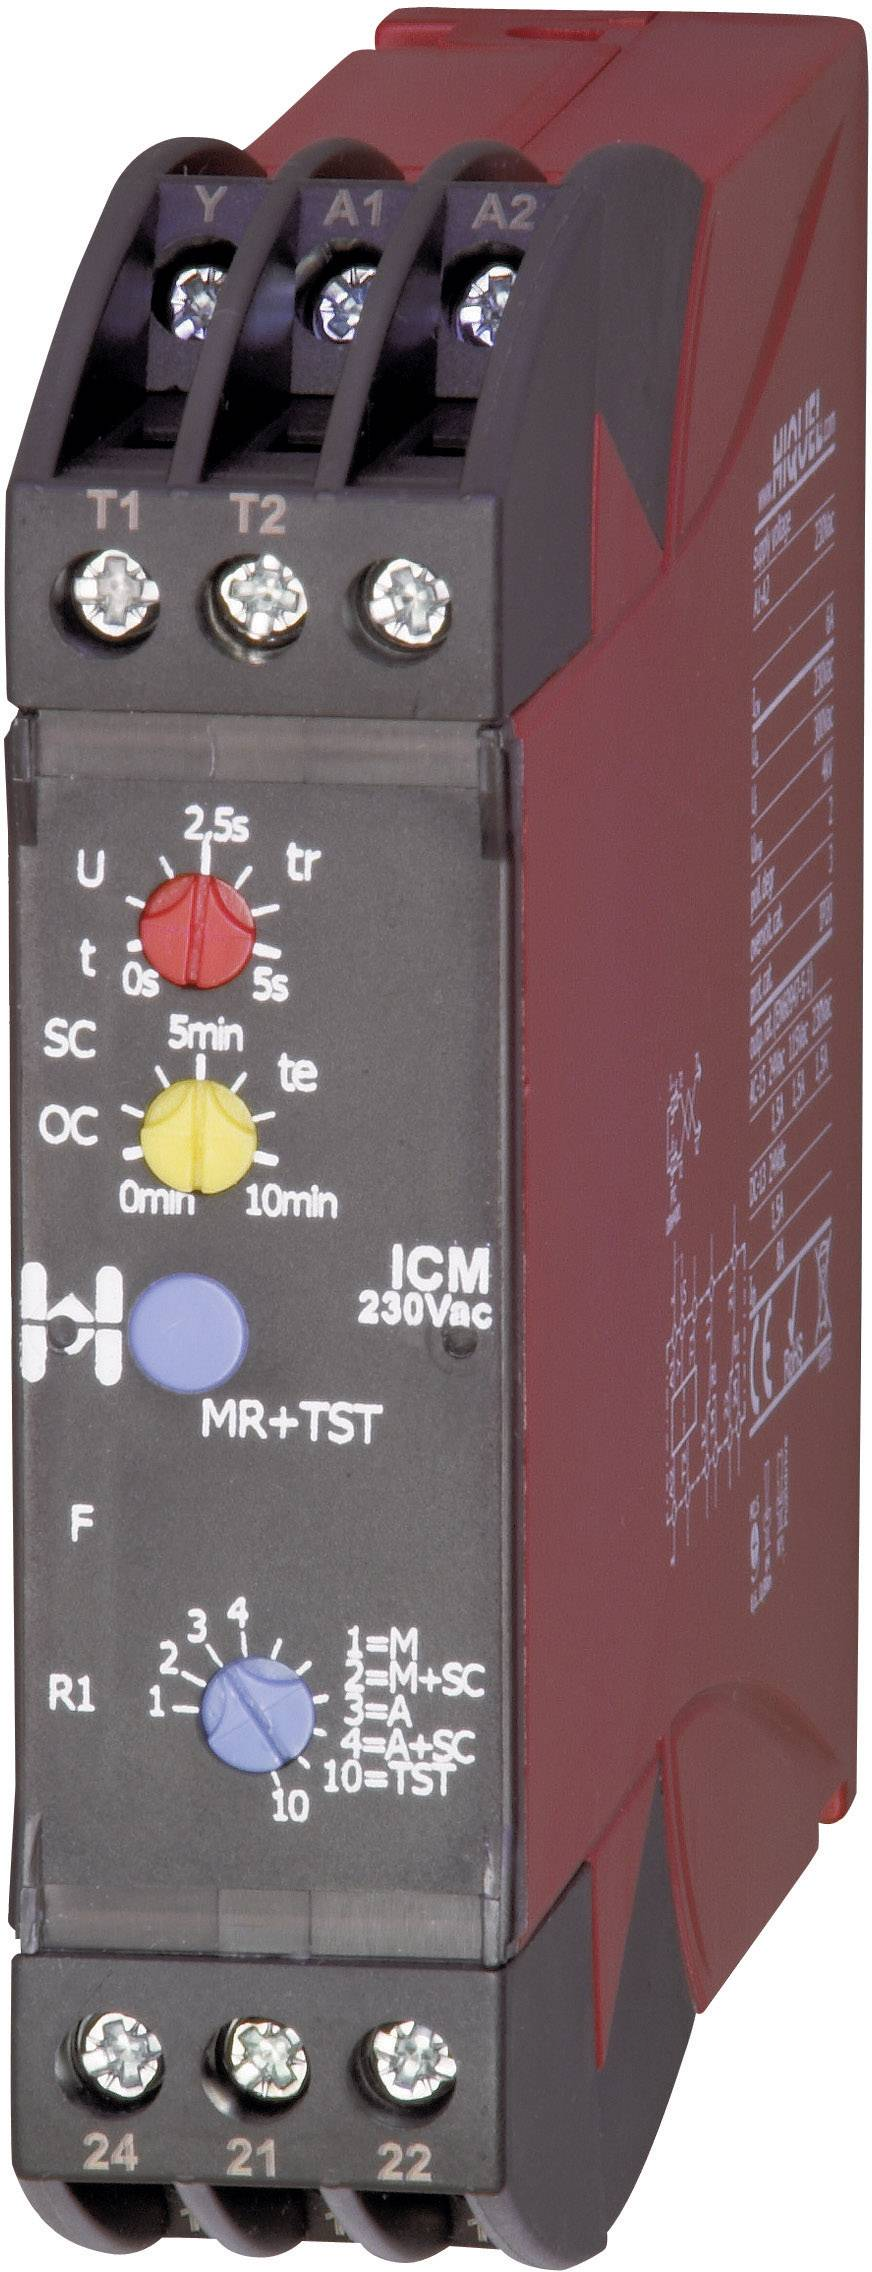 Ochranné relé motora Hiquel ICM 230Vac ICM 230Vac